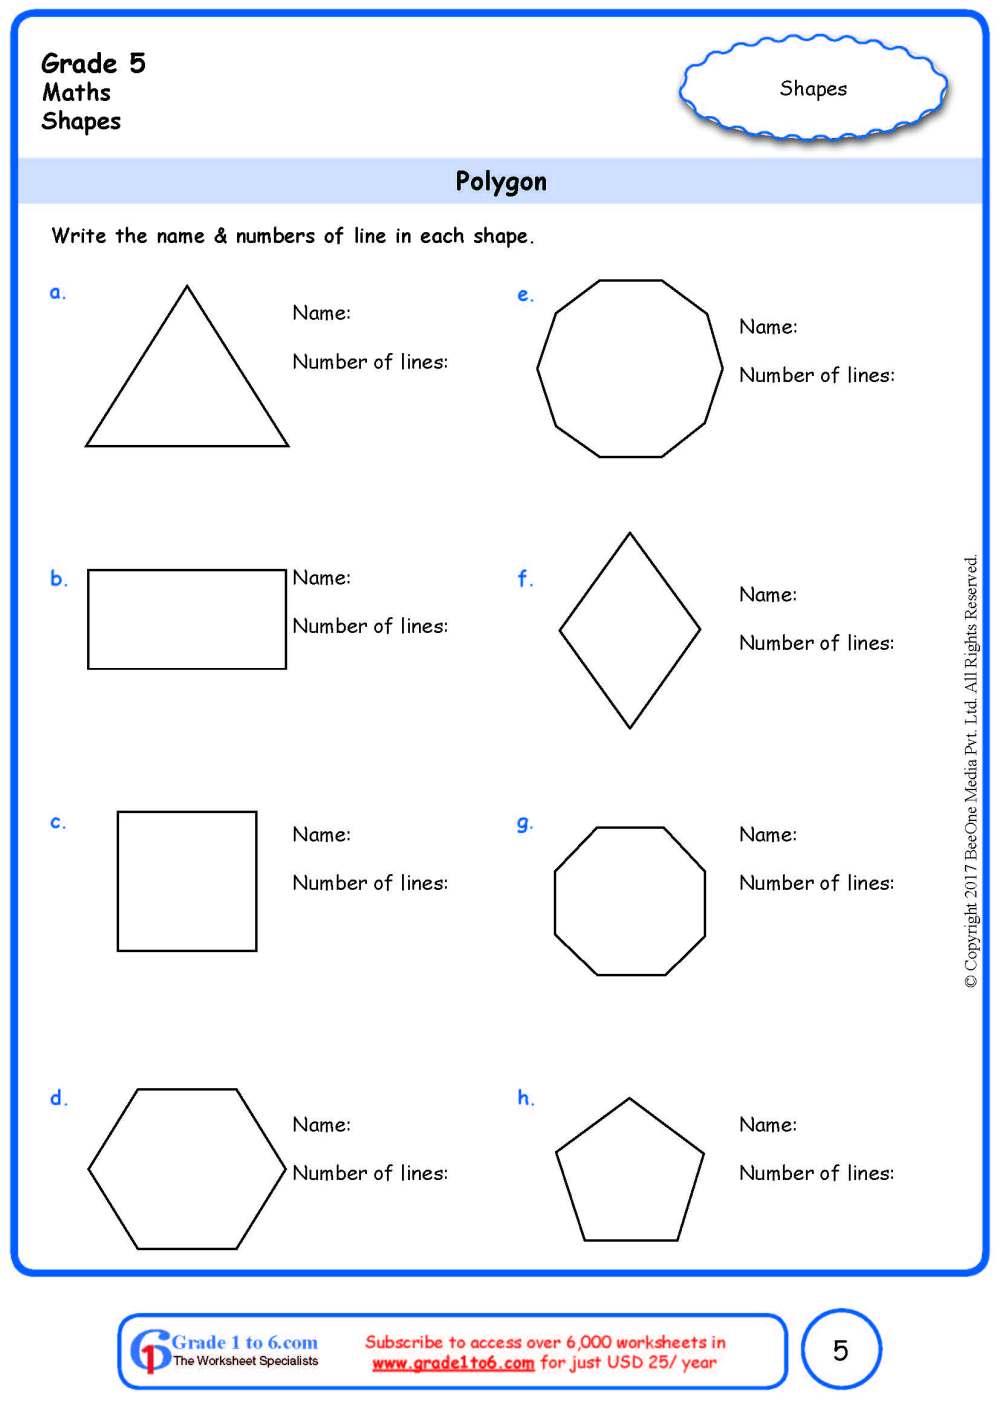 medium resolution of Grade 5 Geometry Worksheets: Polygon www.grade1to6.com